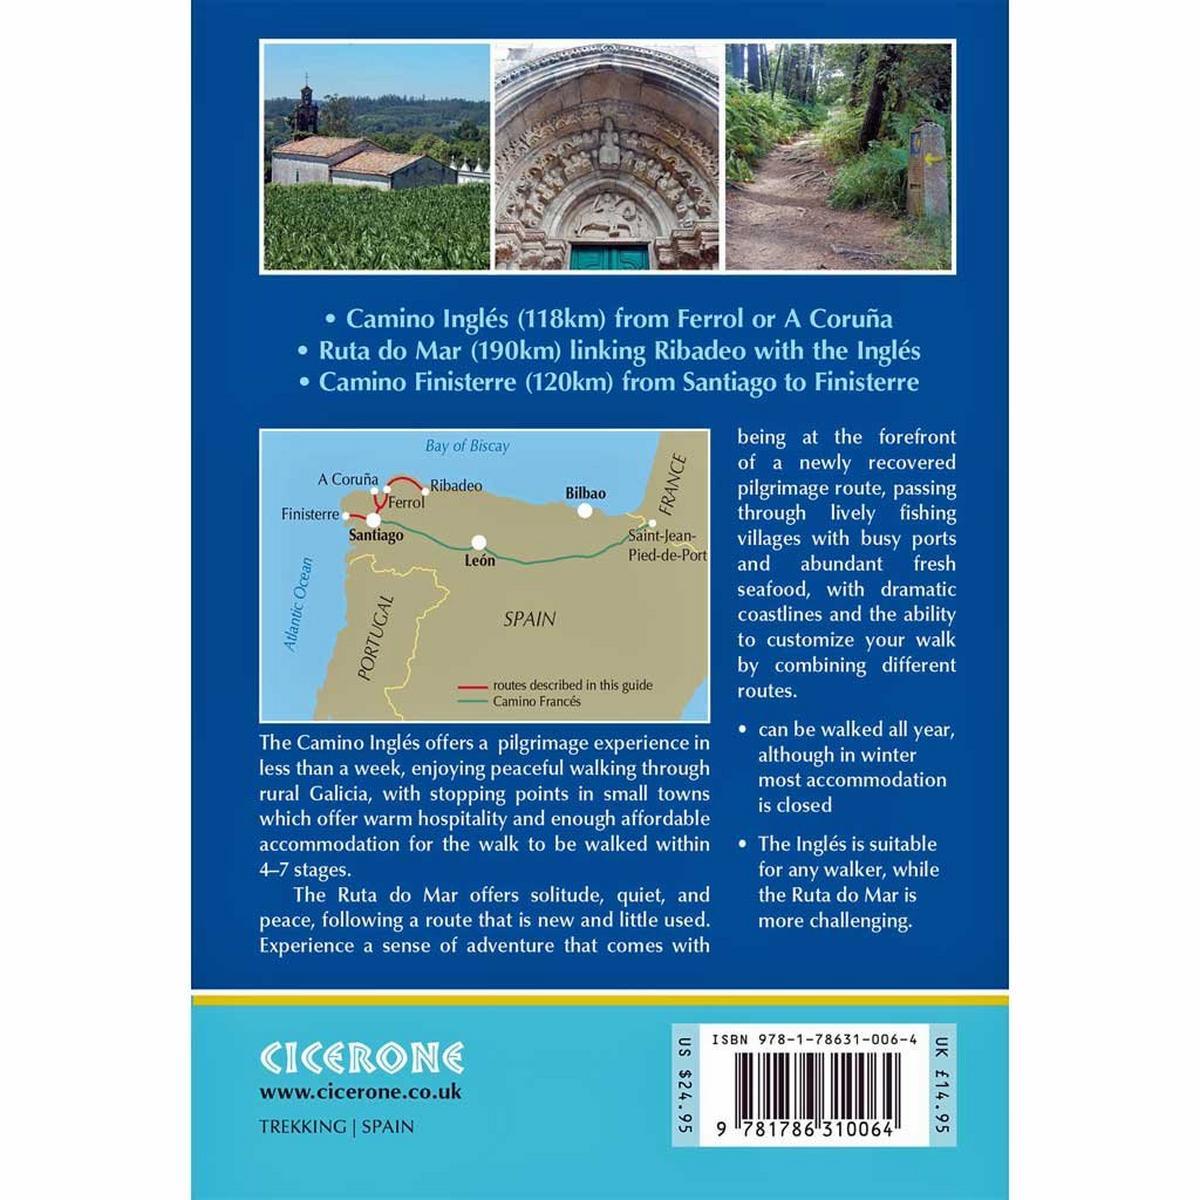 Cicerone Walking Guide Book: Camino Ingles and Ruta do Mar